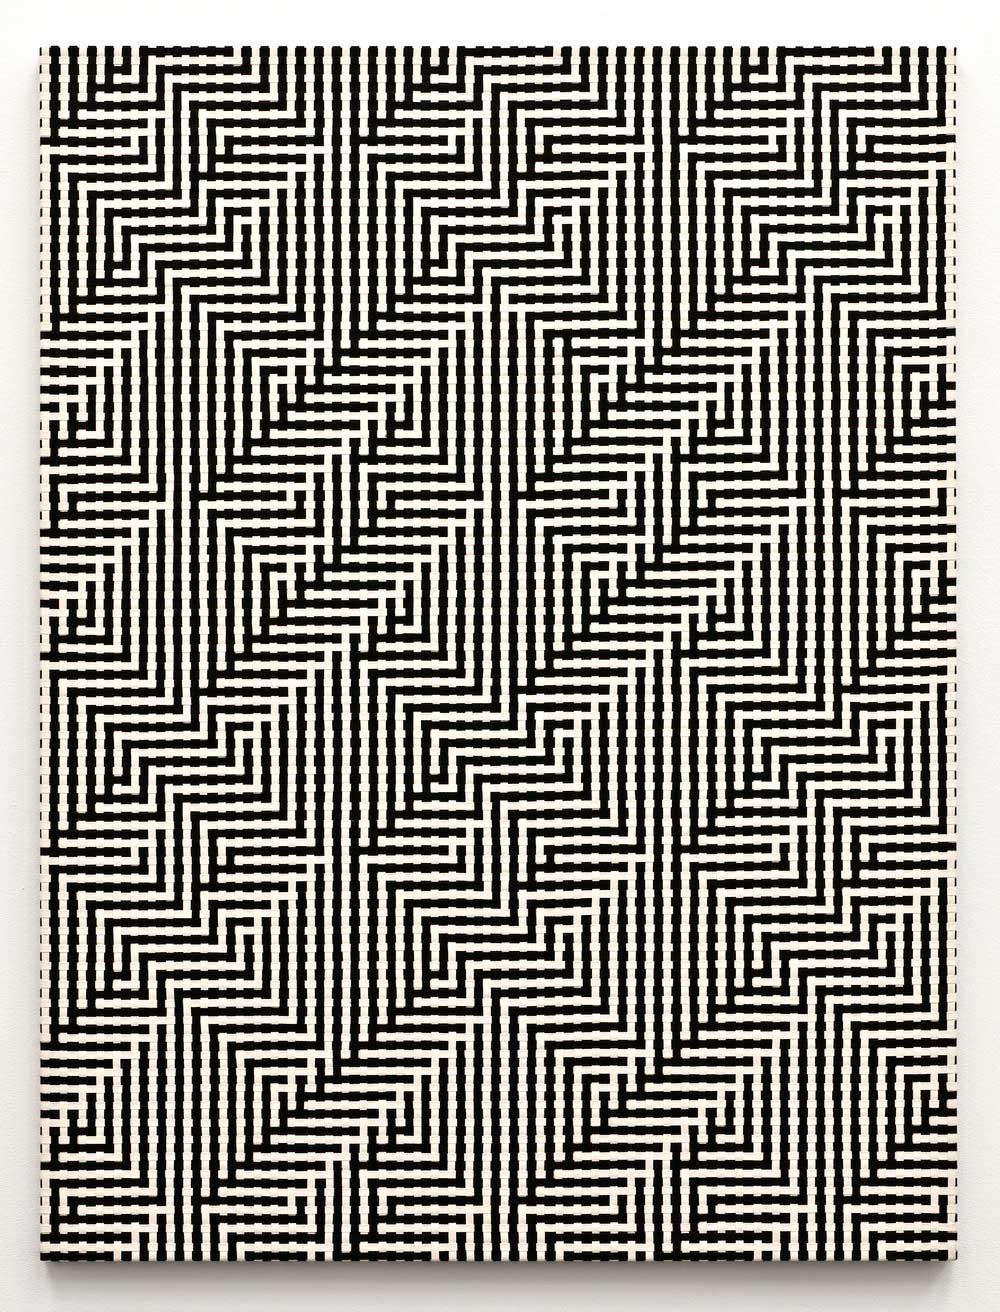 0303 Shadow Weave Tauba Auerbach | Yellowtrace